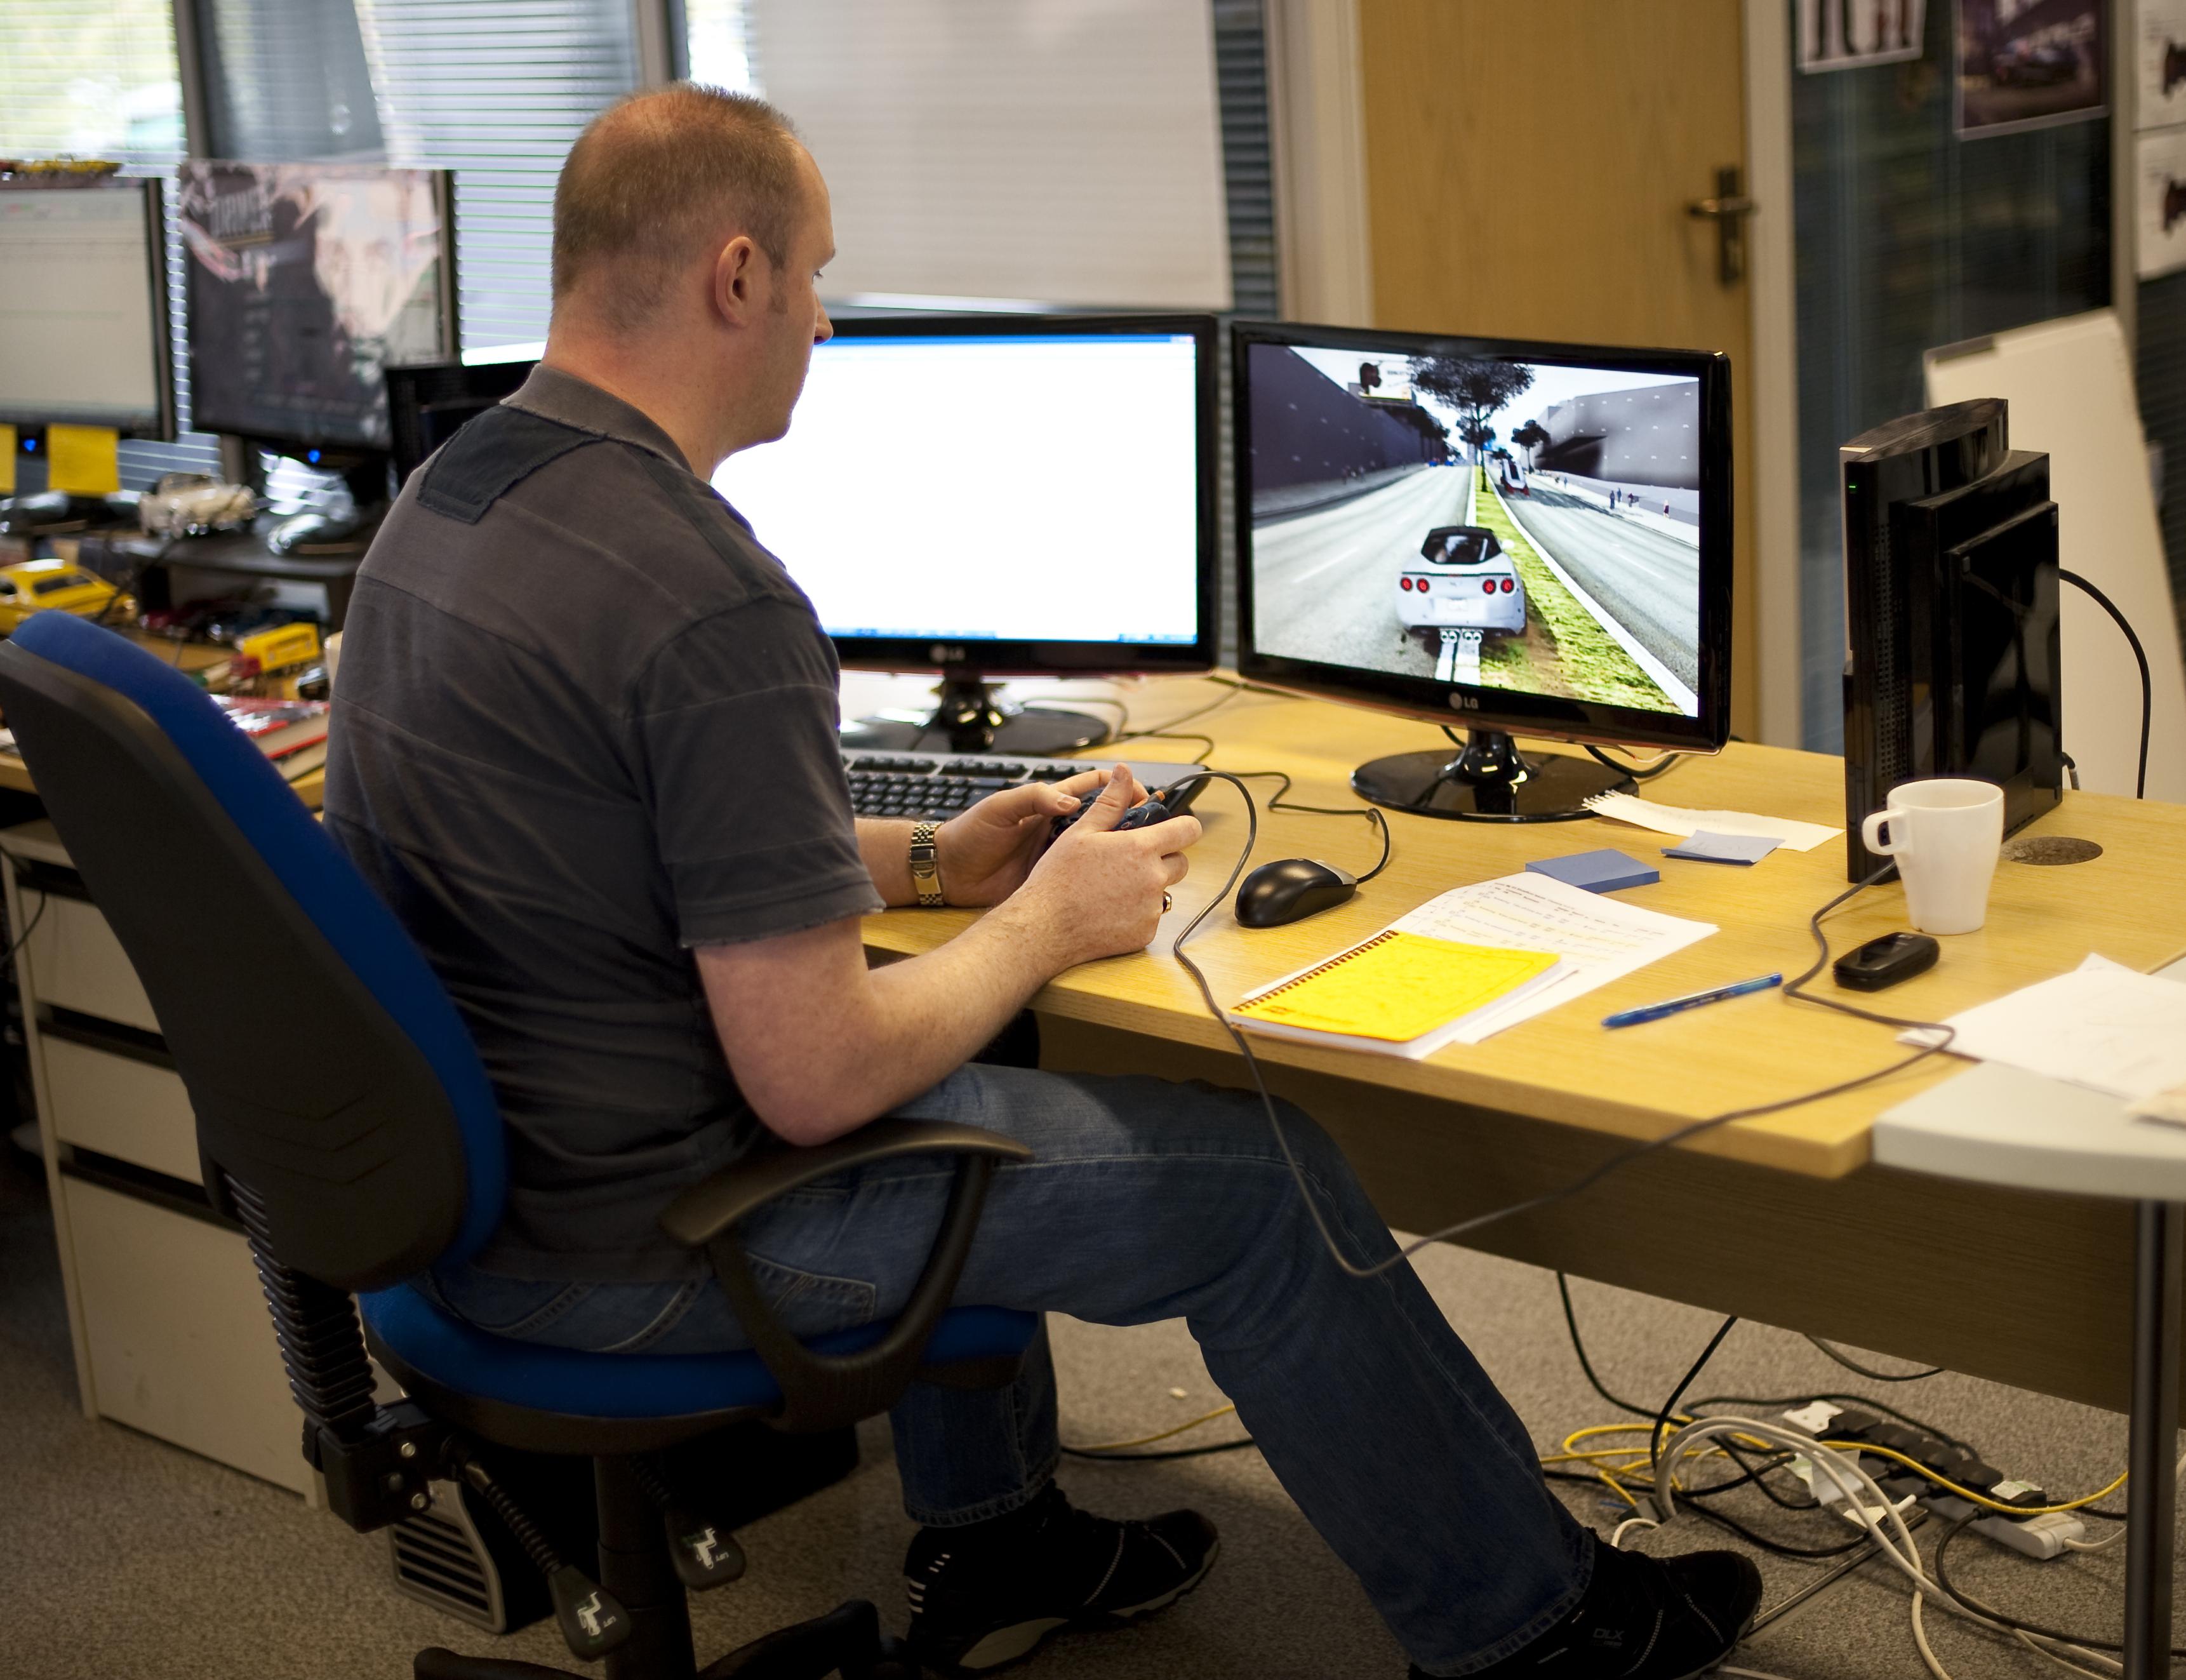 Ubisoft, Inside Newcastle Office,Press Kit Shots